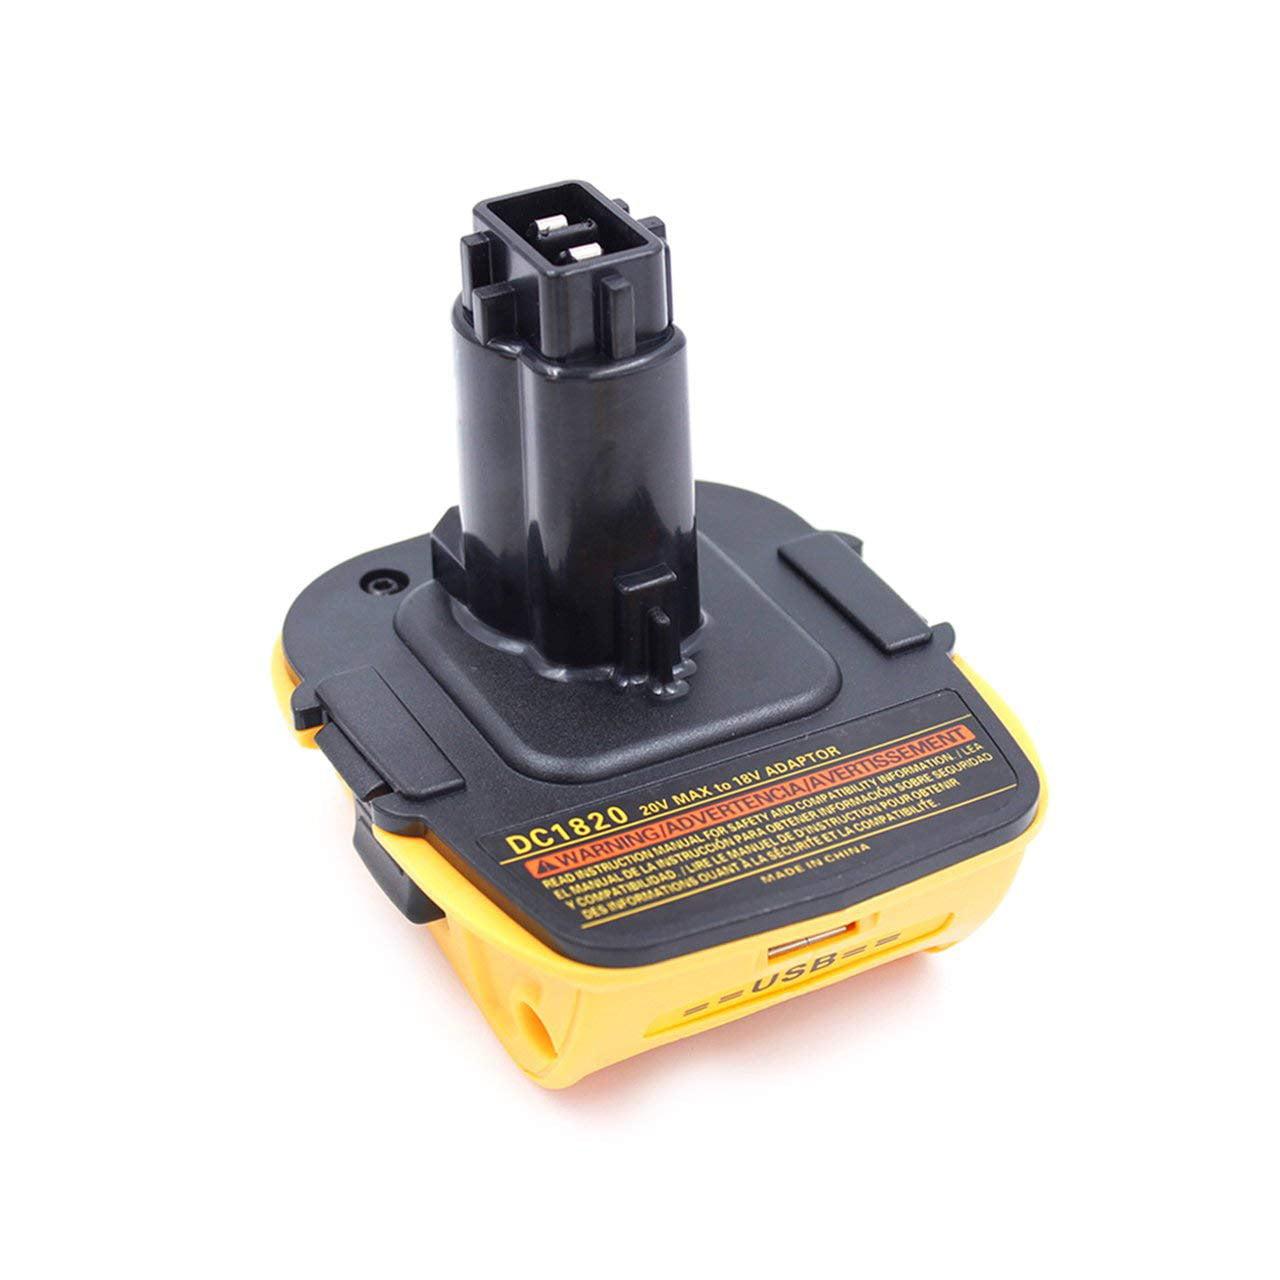 20V Battery Adapter DCA1820 for Dewalt 18V Tools Convert ...